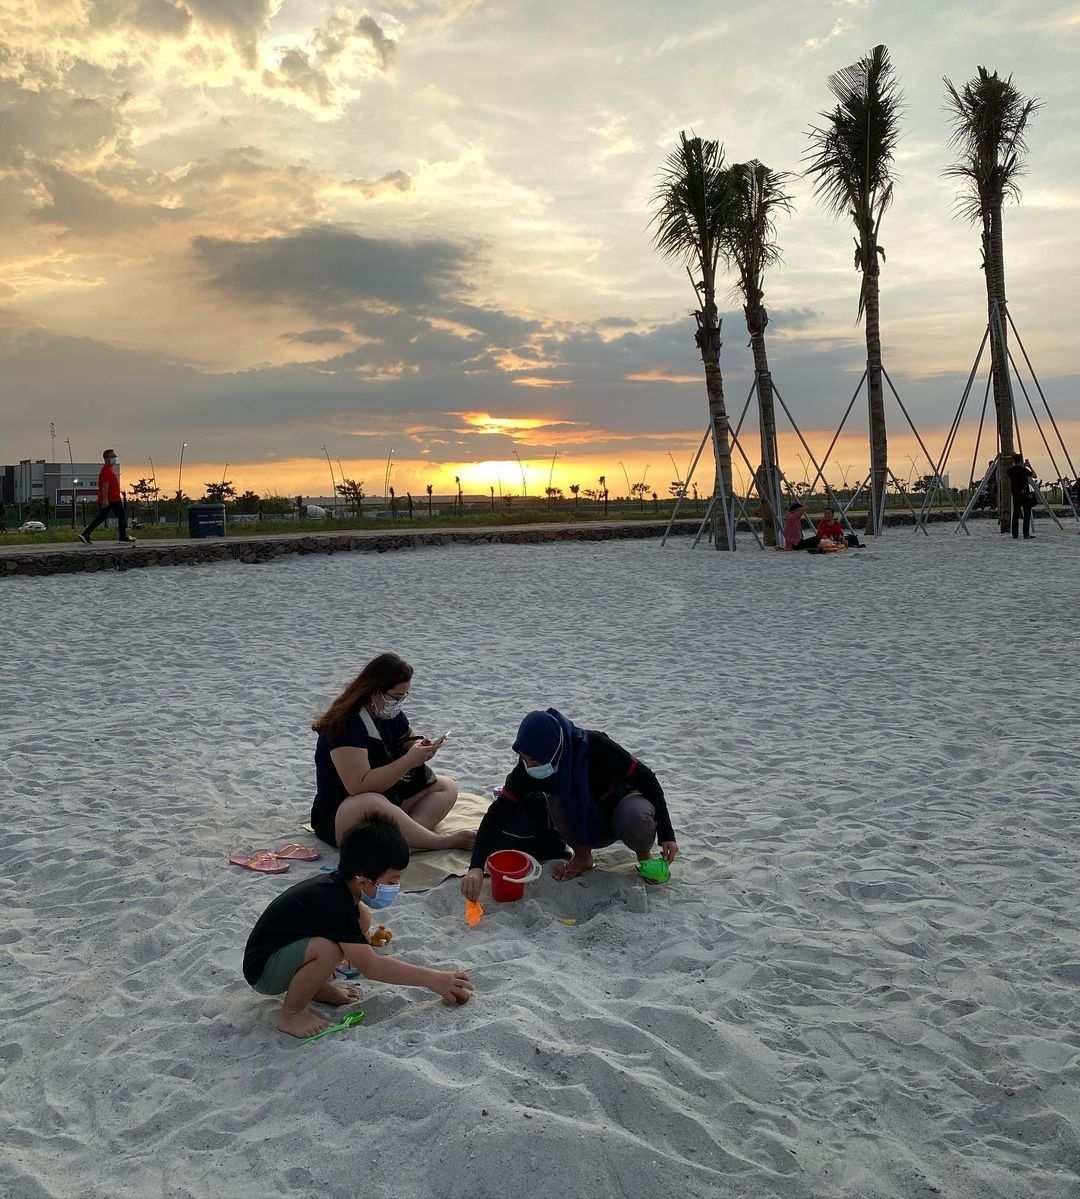 Bermain Pasir di Pantai Pasir Putih Jakarta Utara Image From @hanschristianshen